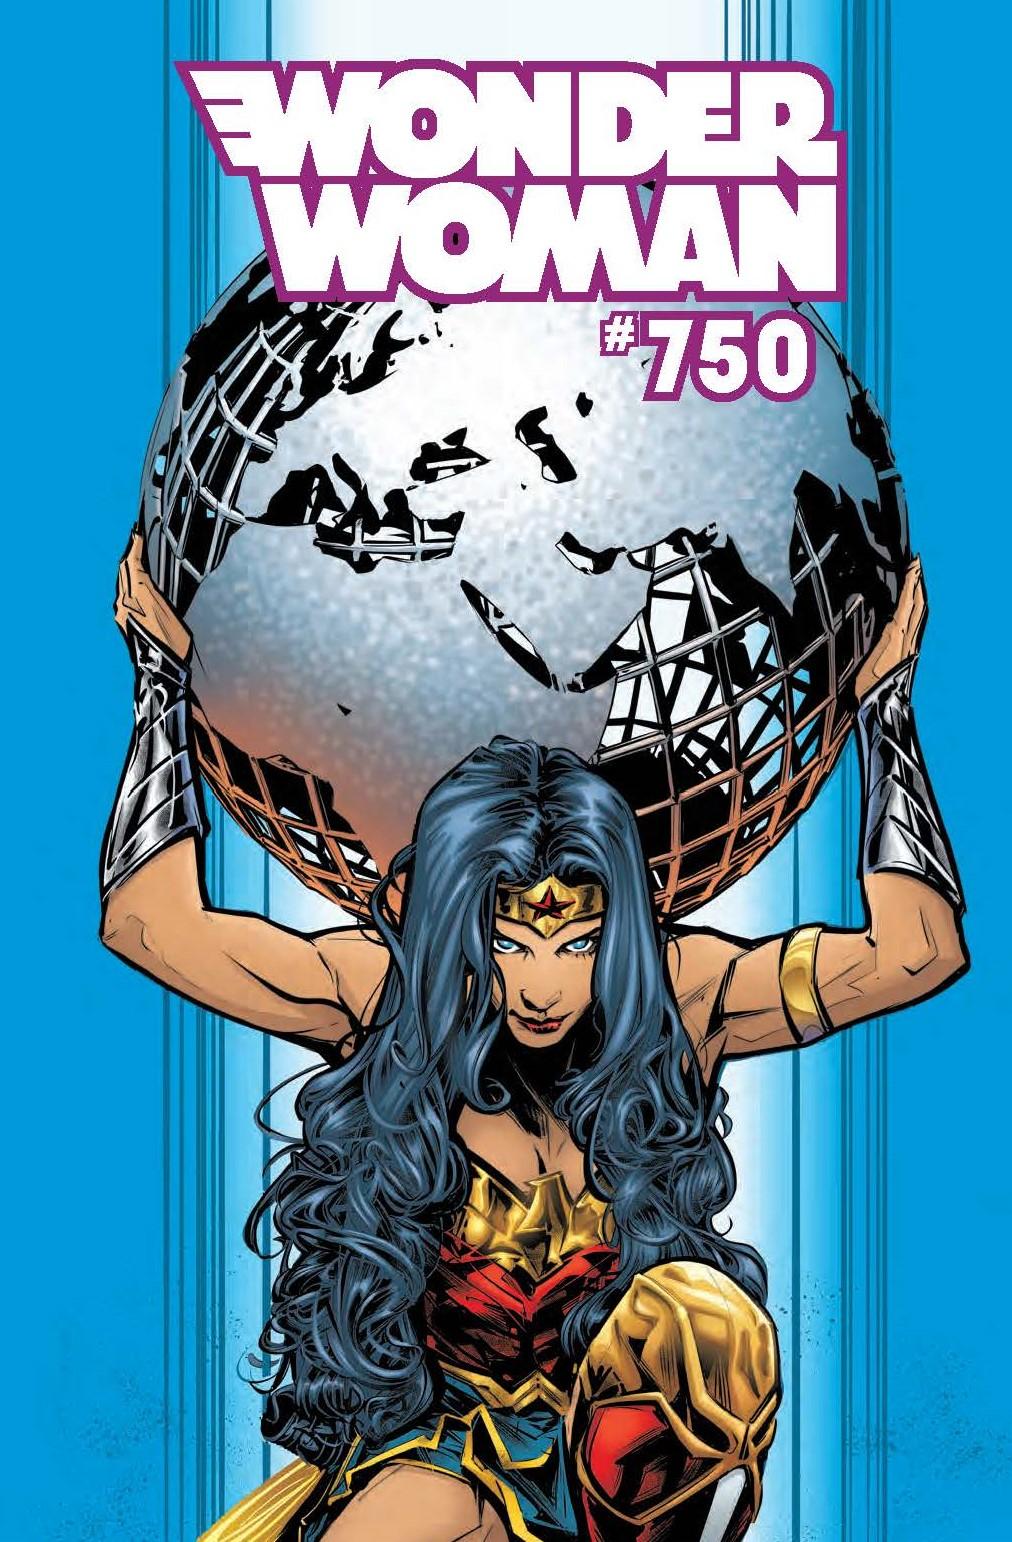 Wonder Woman 750 Catwoman artist dc comics Joelle jones